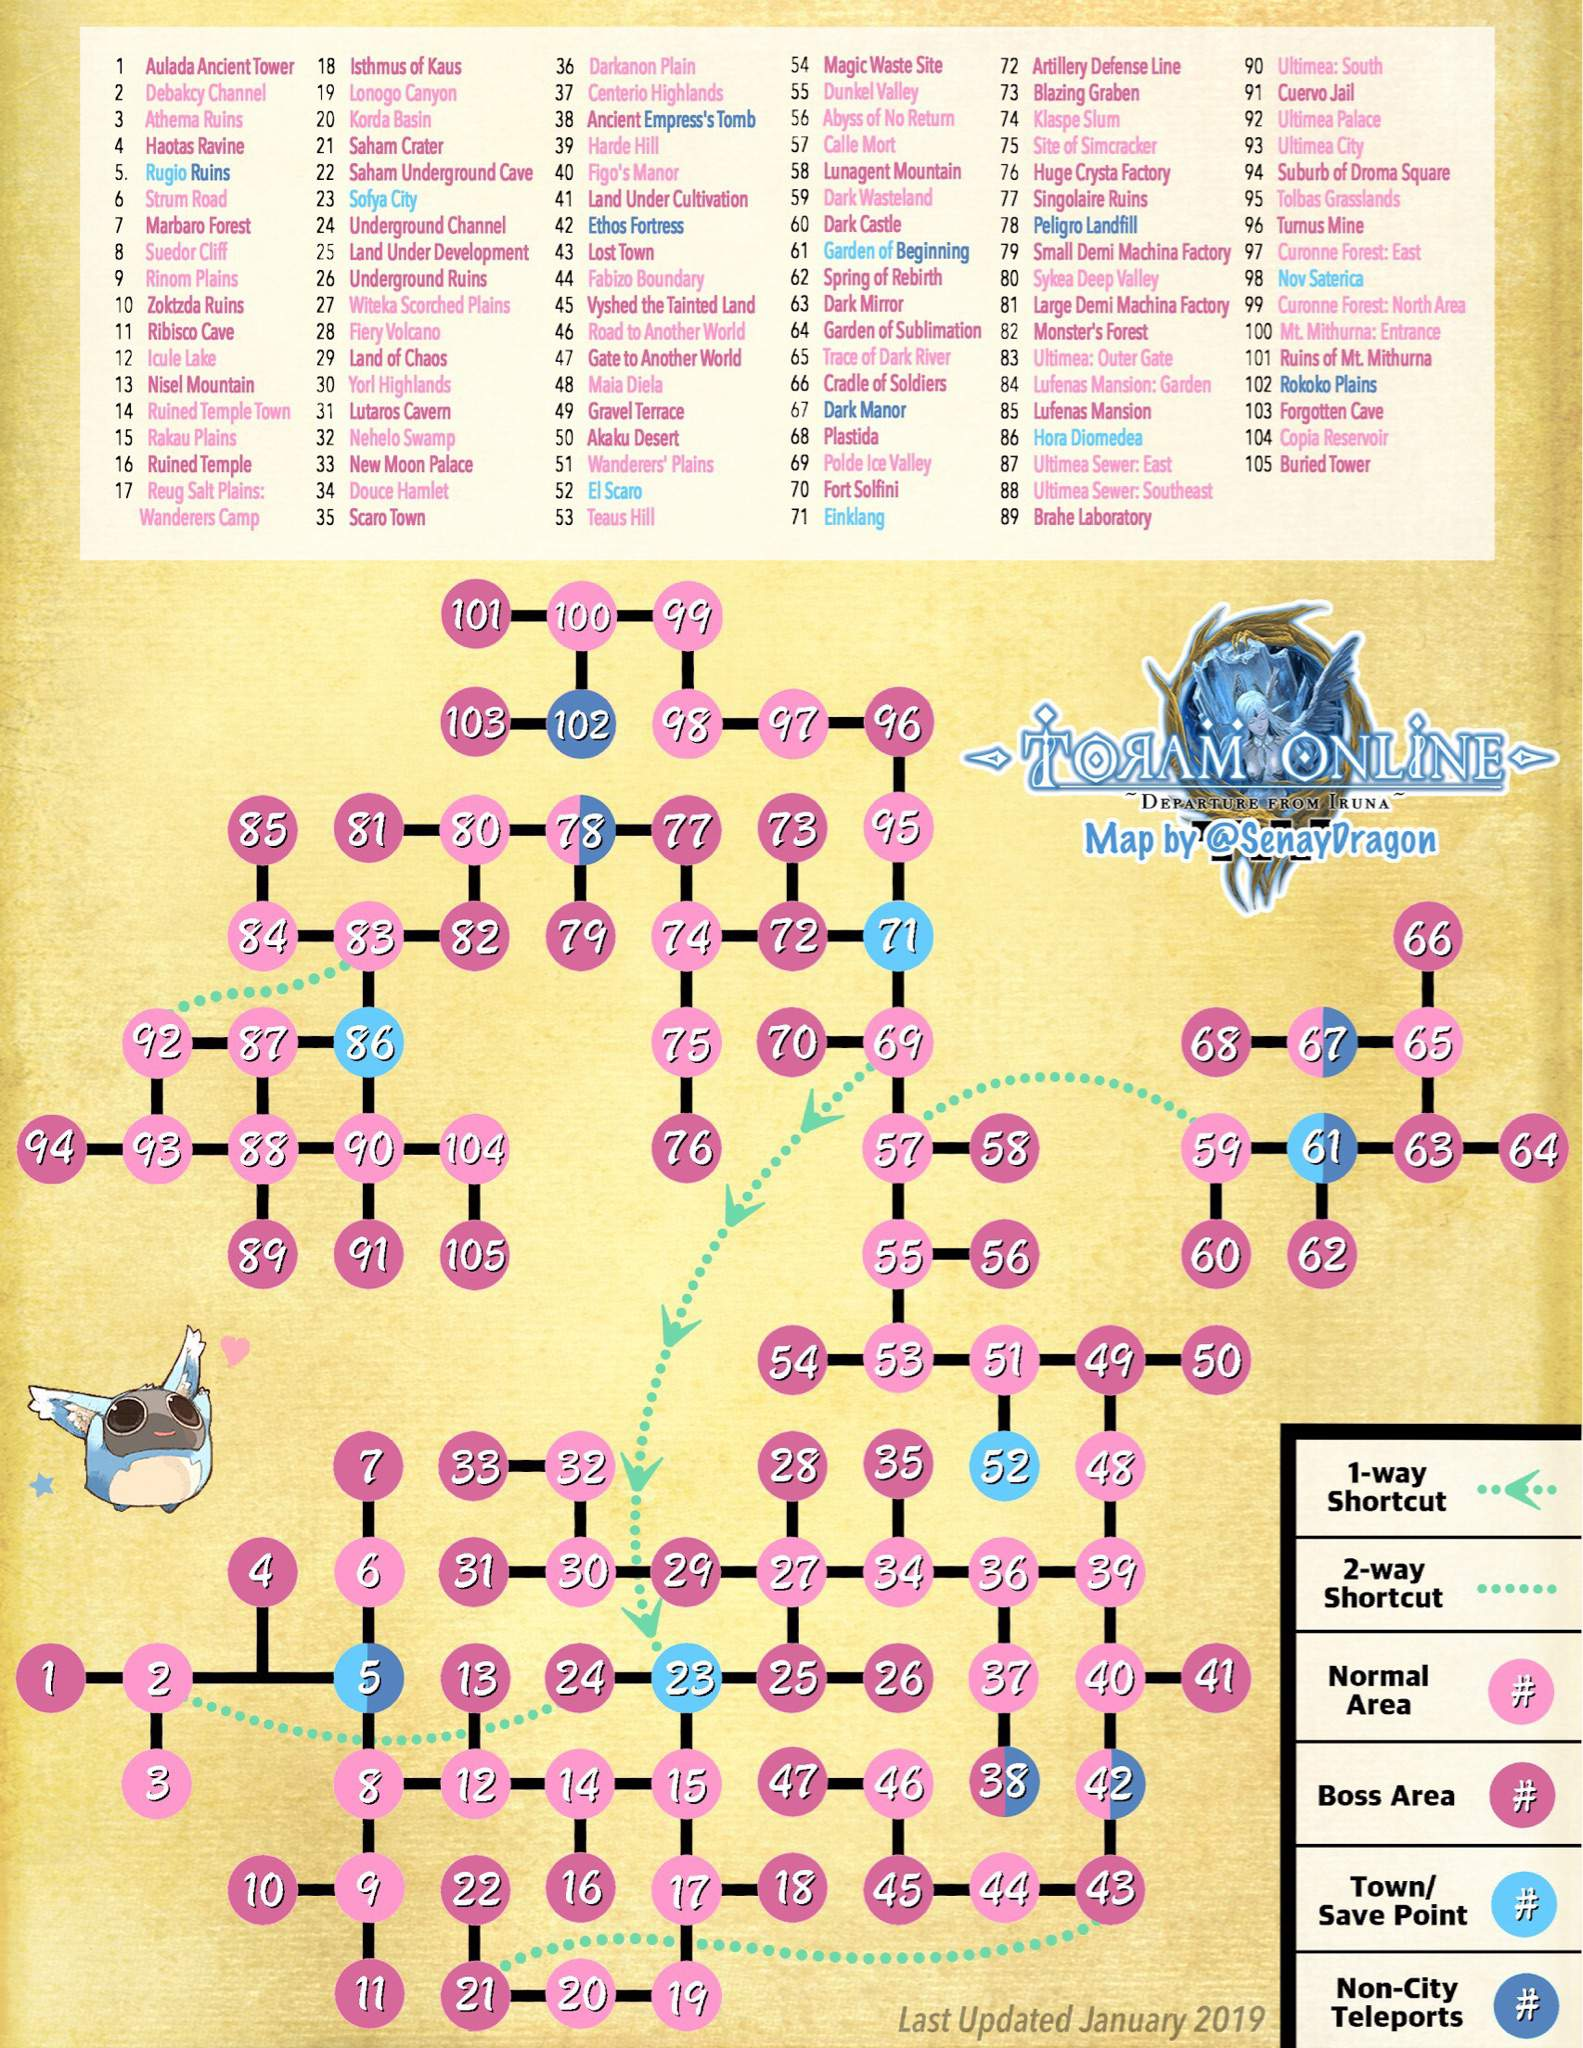 toram online world map Toram Map January 2019 Toram Online Amino